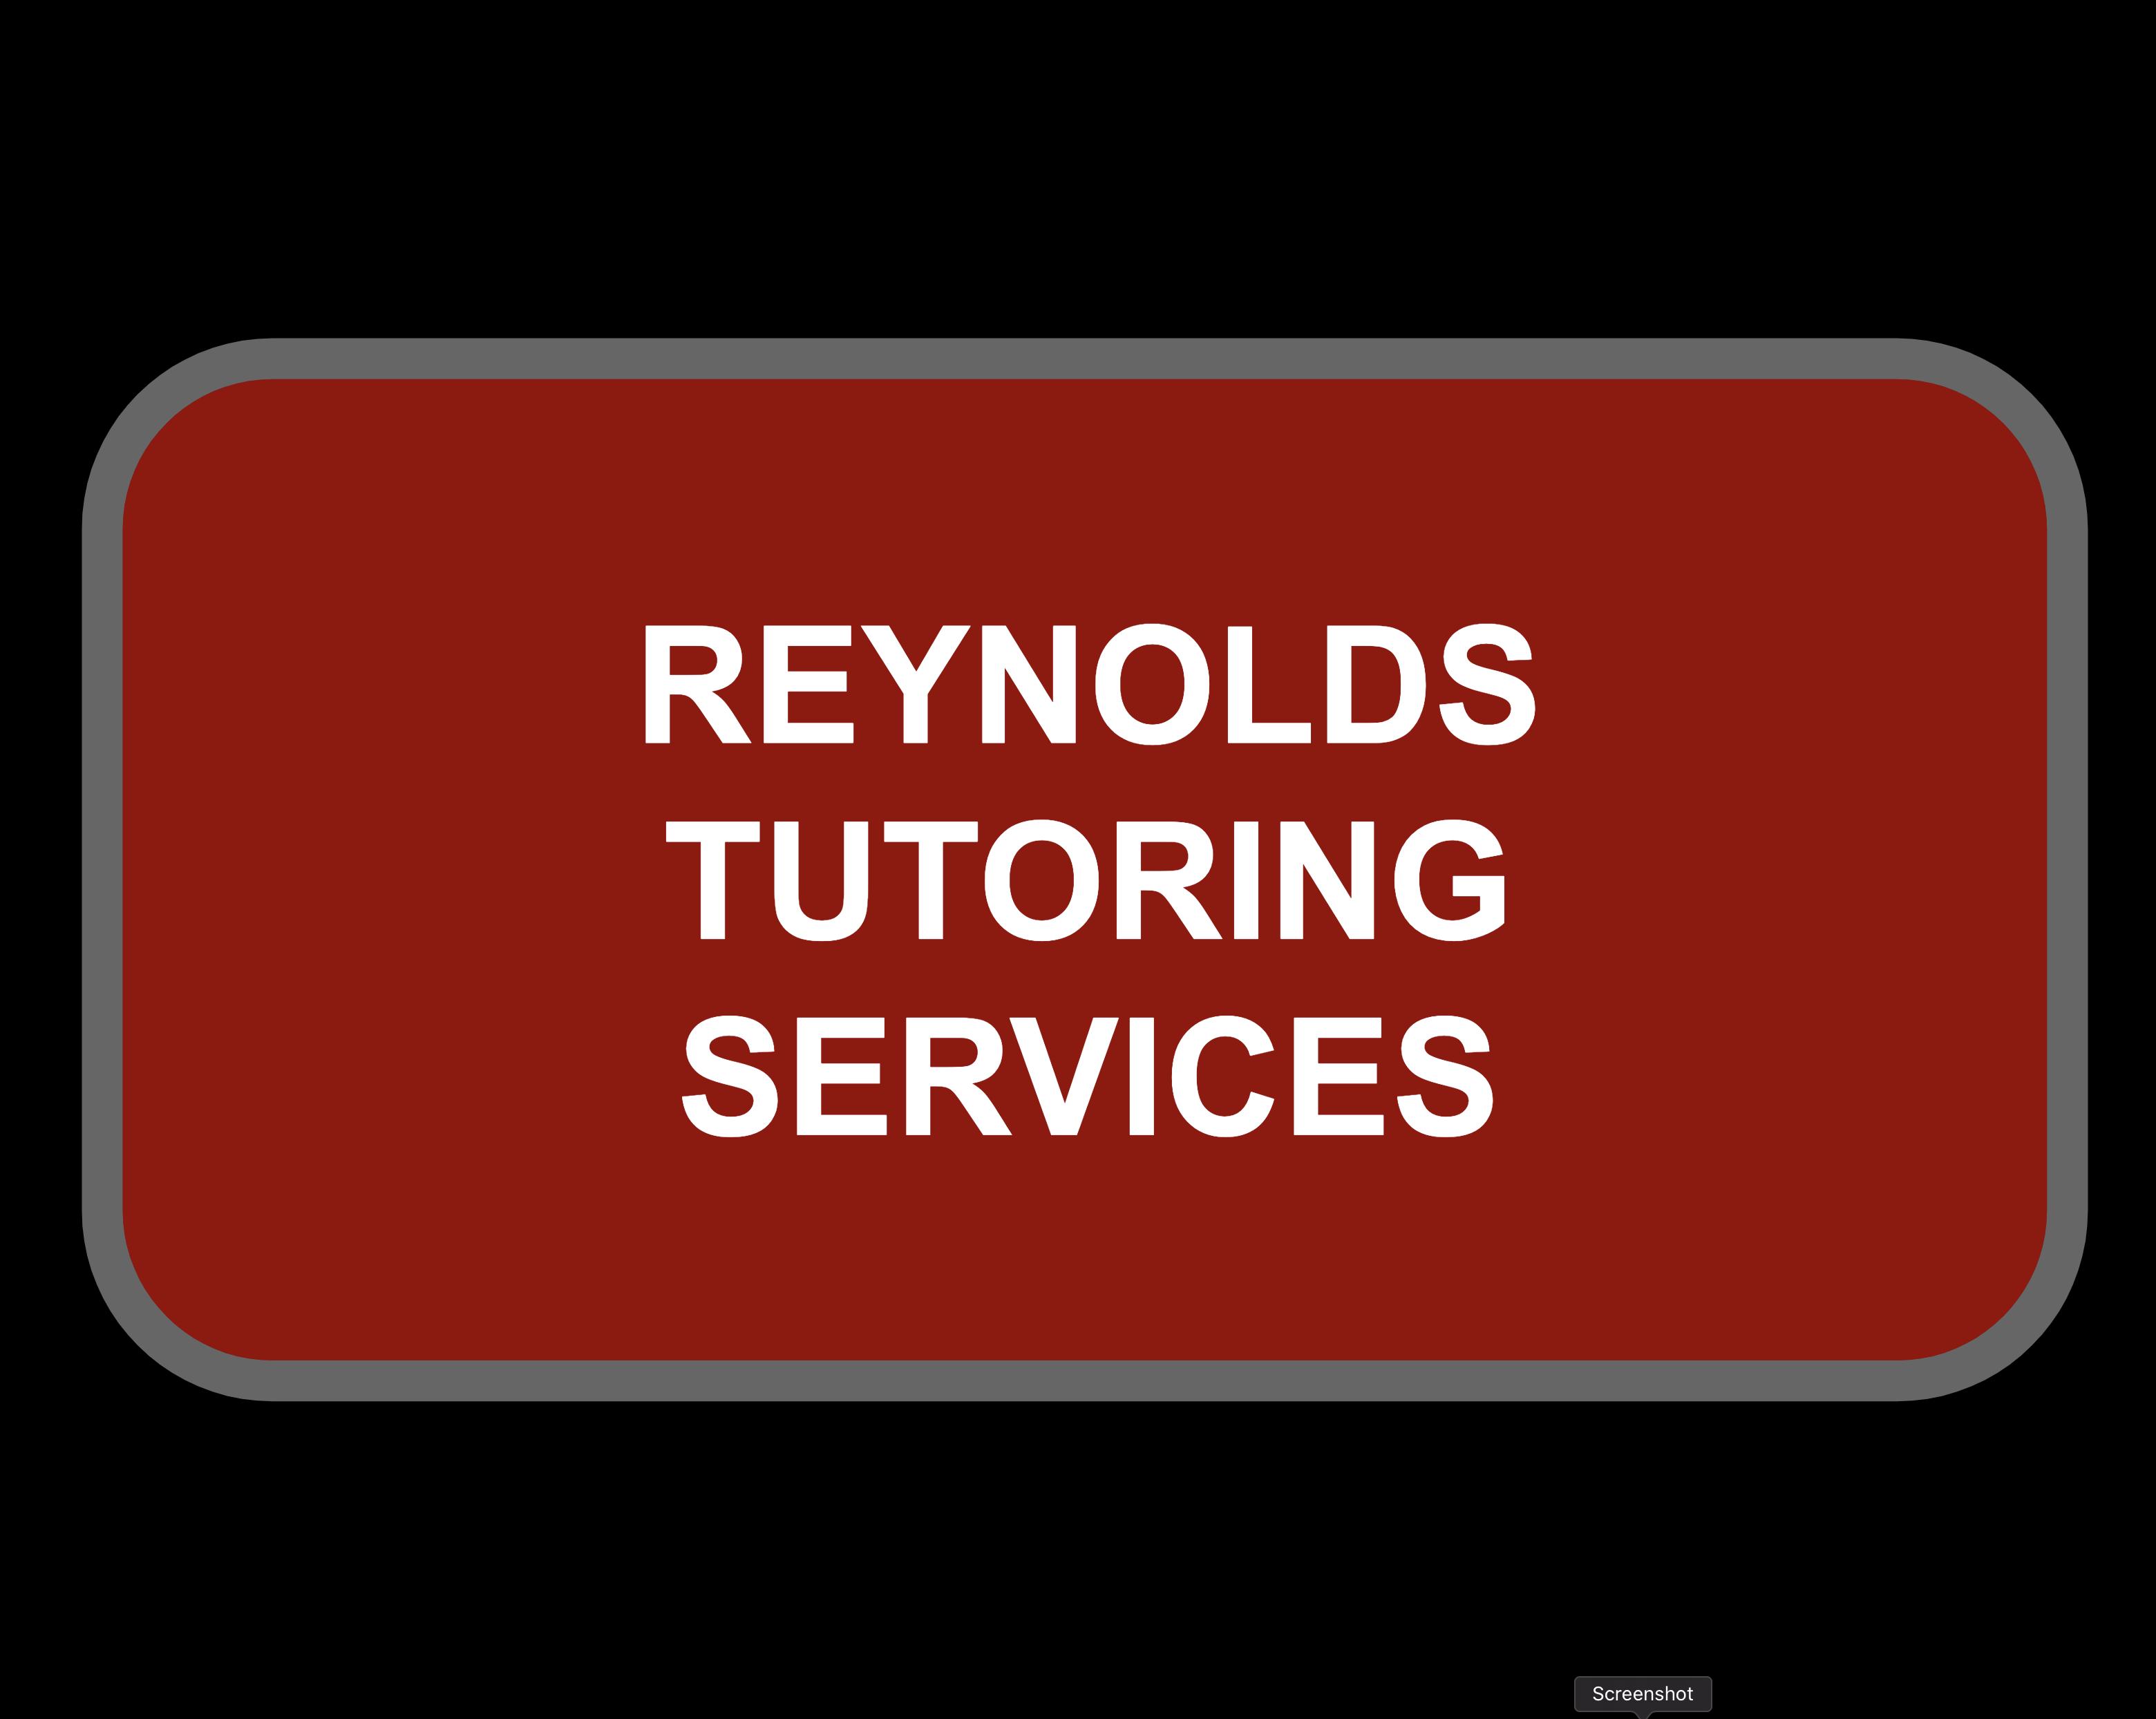 Reynolds Tutoring Service